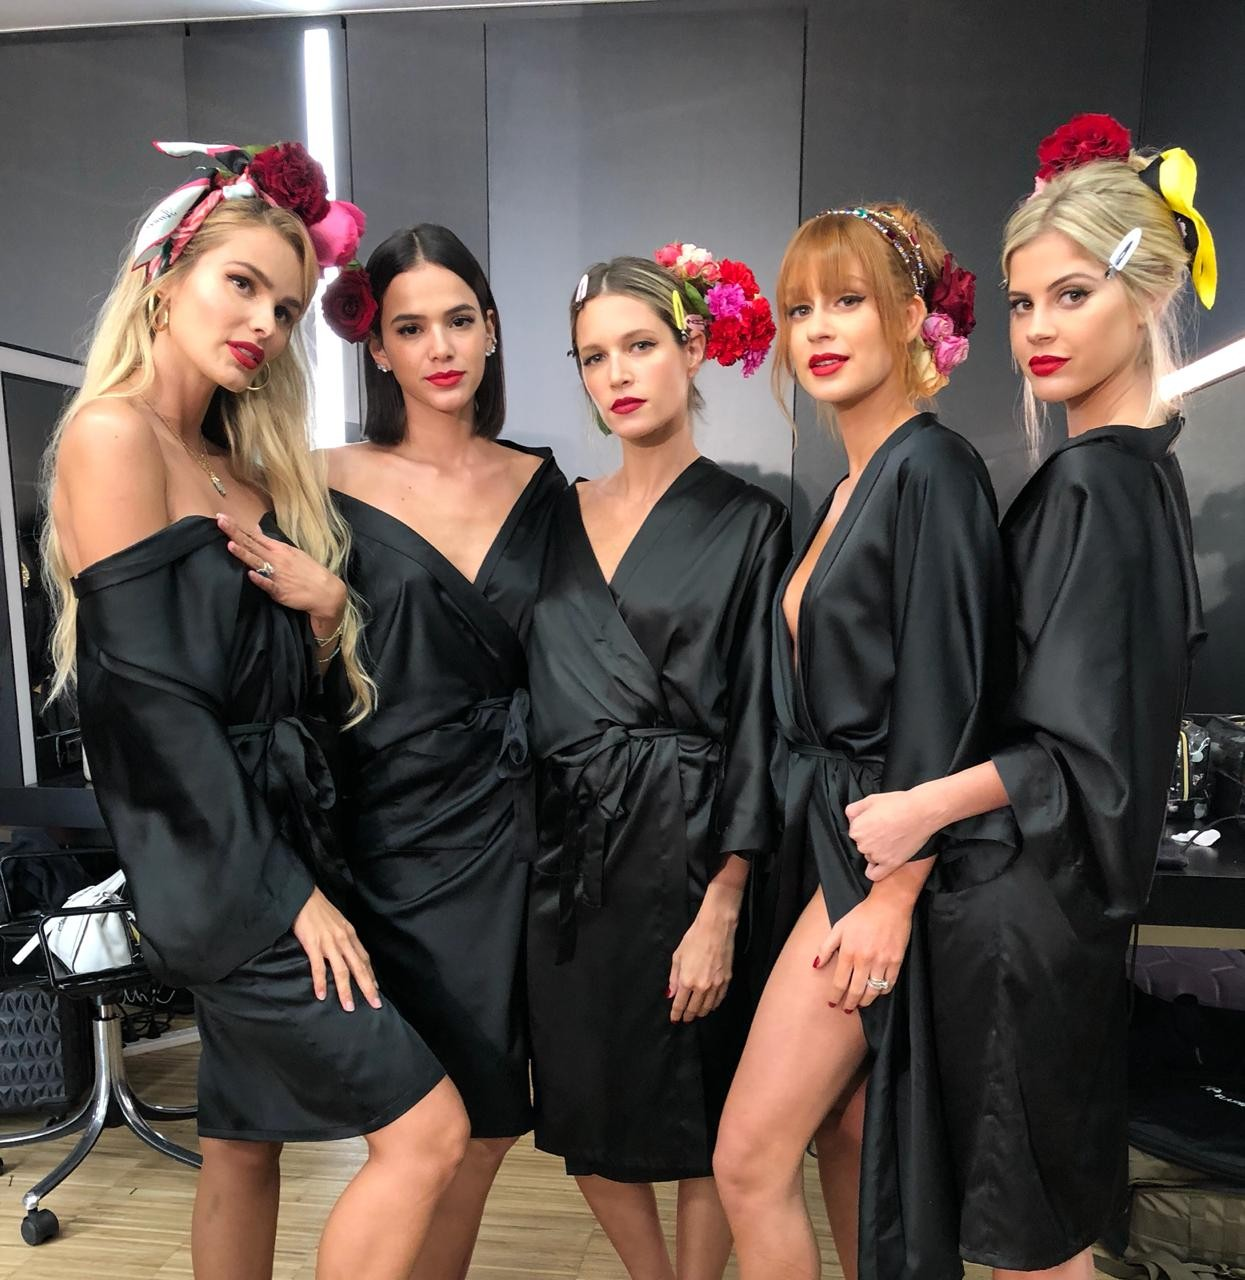 Bruna Marquezine, Yasmin Brunet, Marina Ruy Barbosa, Helena Bordon e Lala Rudge (Foto: Divulgação)